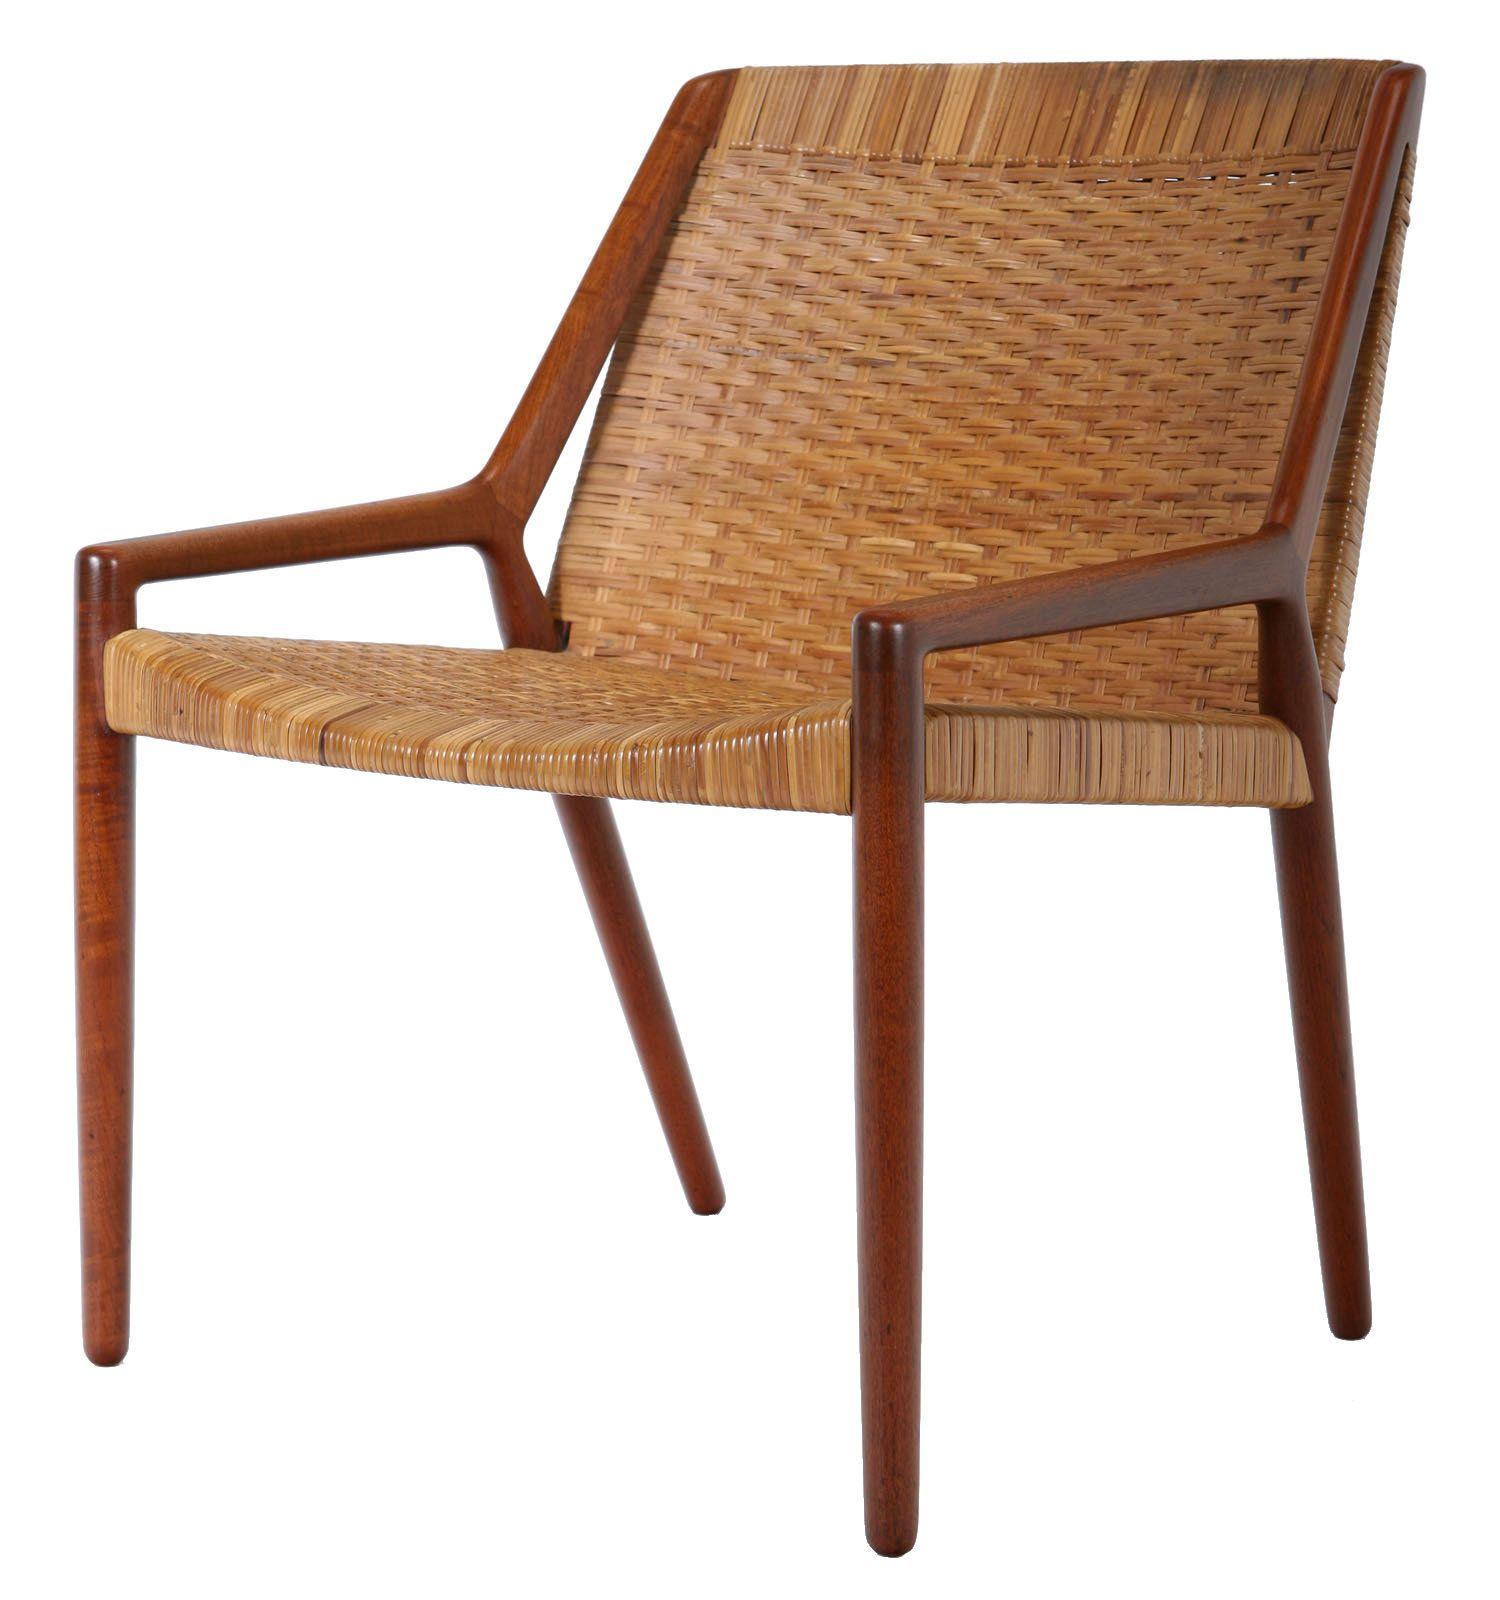 Astounding E Larsen A B Madsen Teak And Cane Easy Chair 1951 Andrewgaddart Wooden Chair Designs For Living Room Andrewgaddartcom